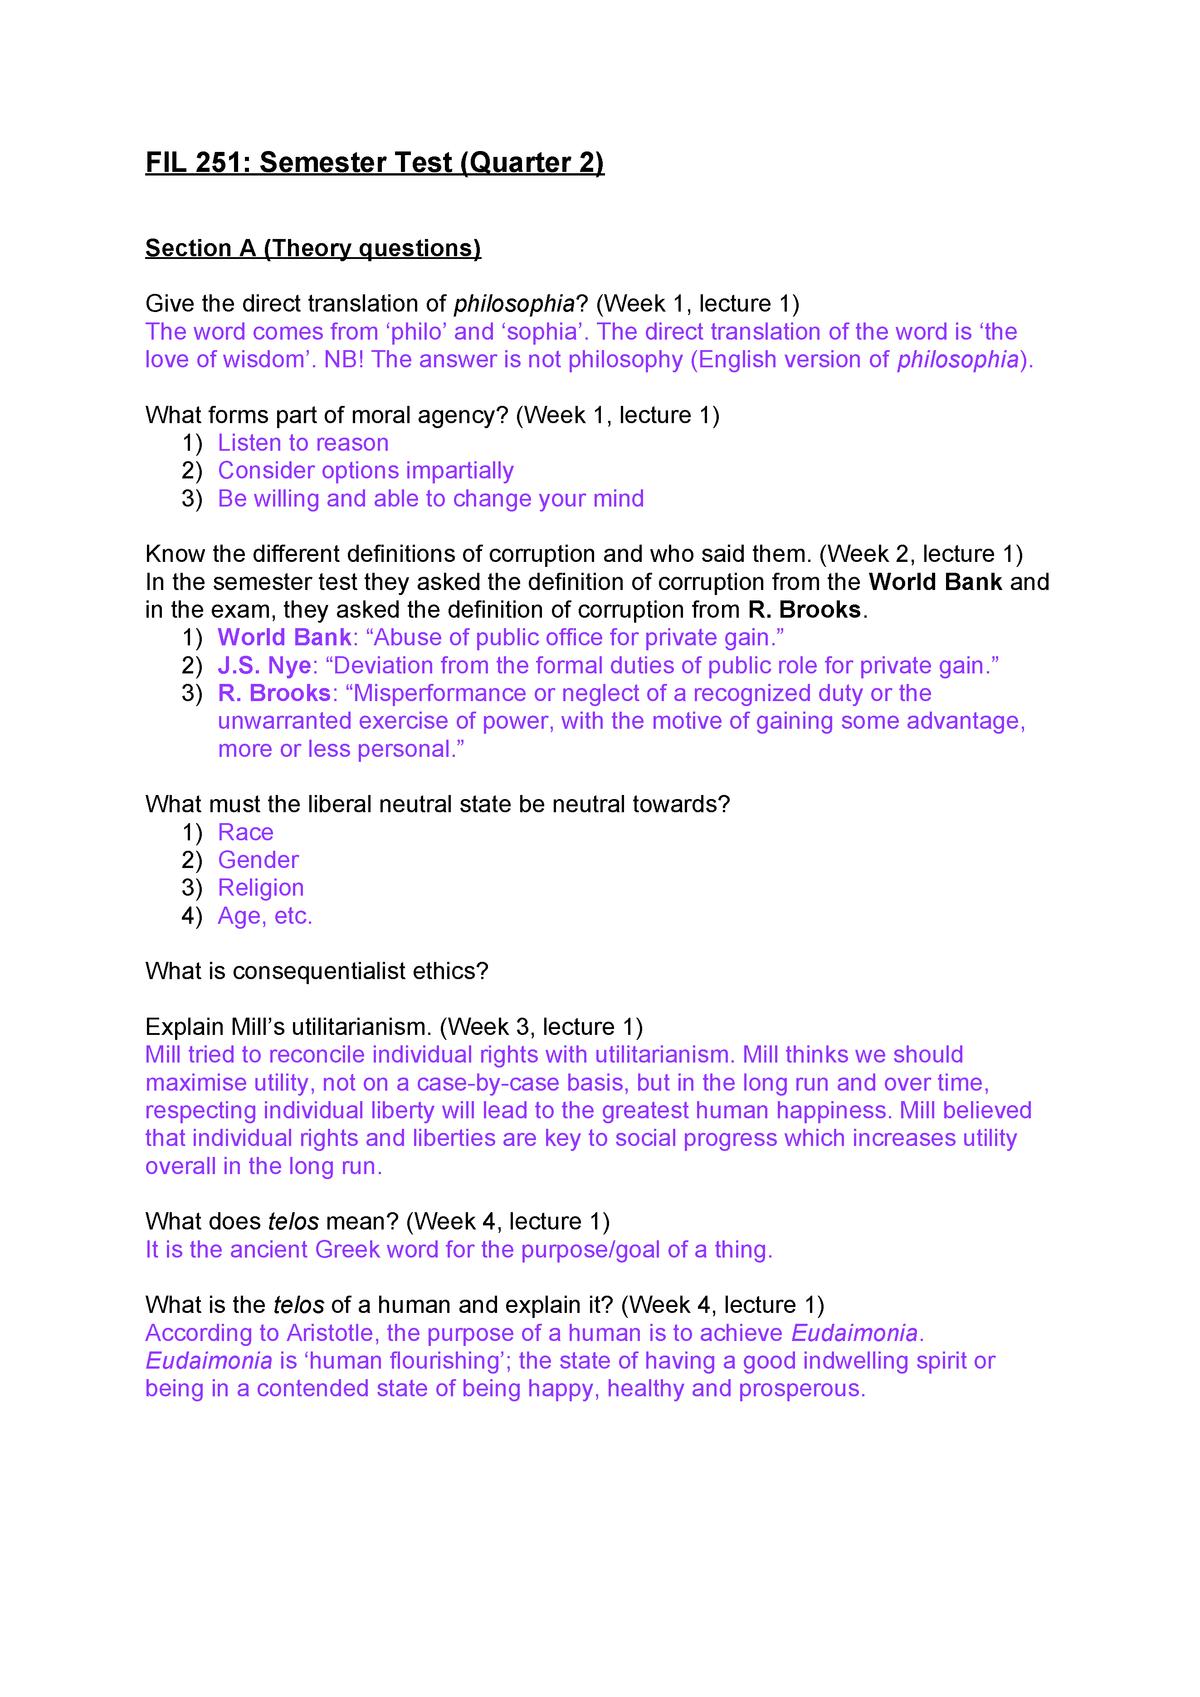 FIL 251 Semester Test (Quarter 2) - FIL 251: Introduction to